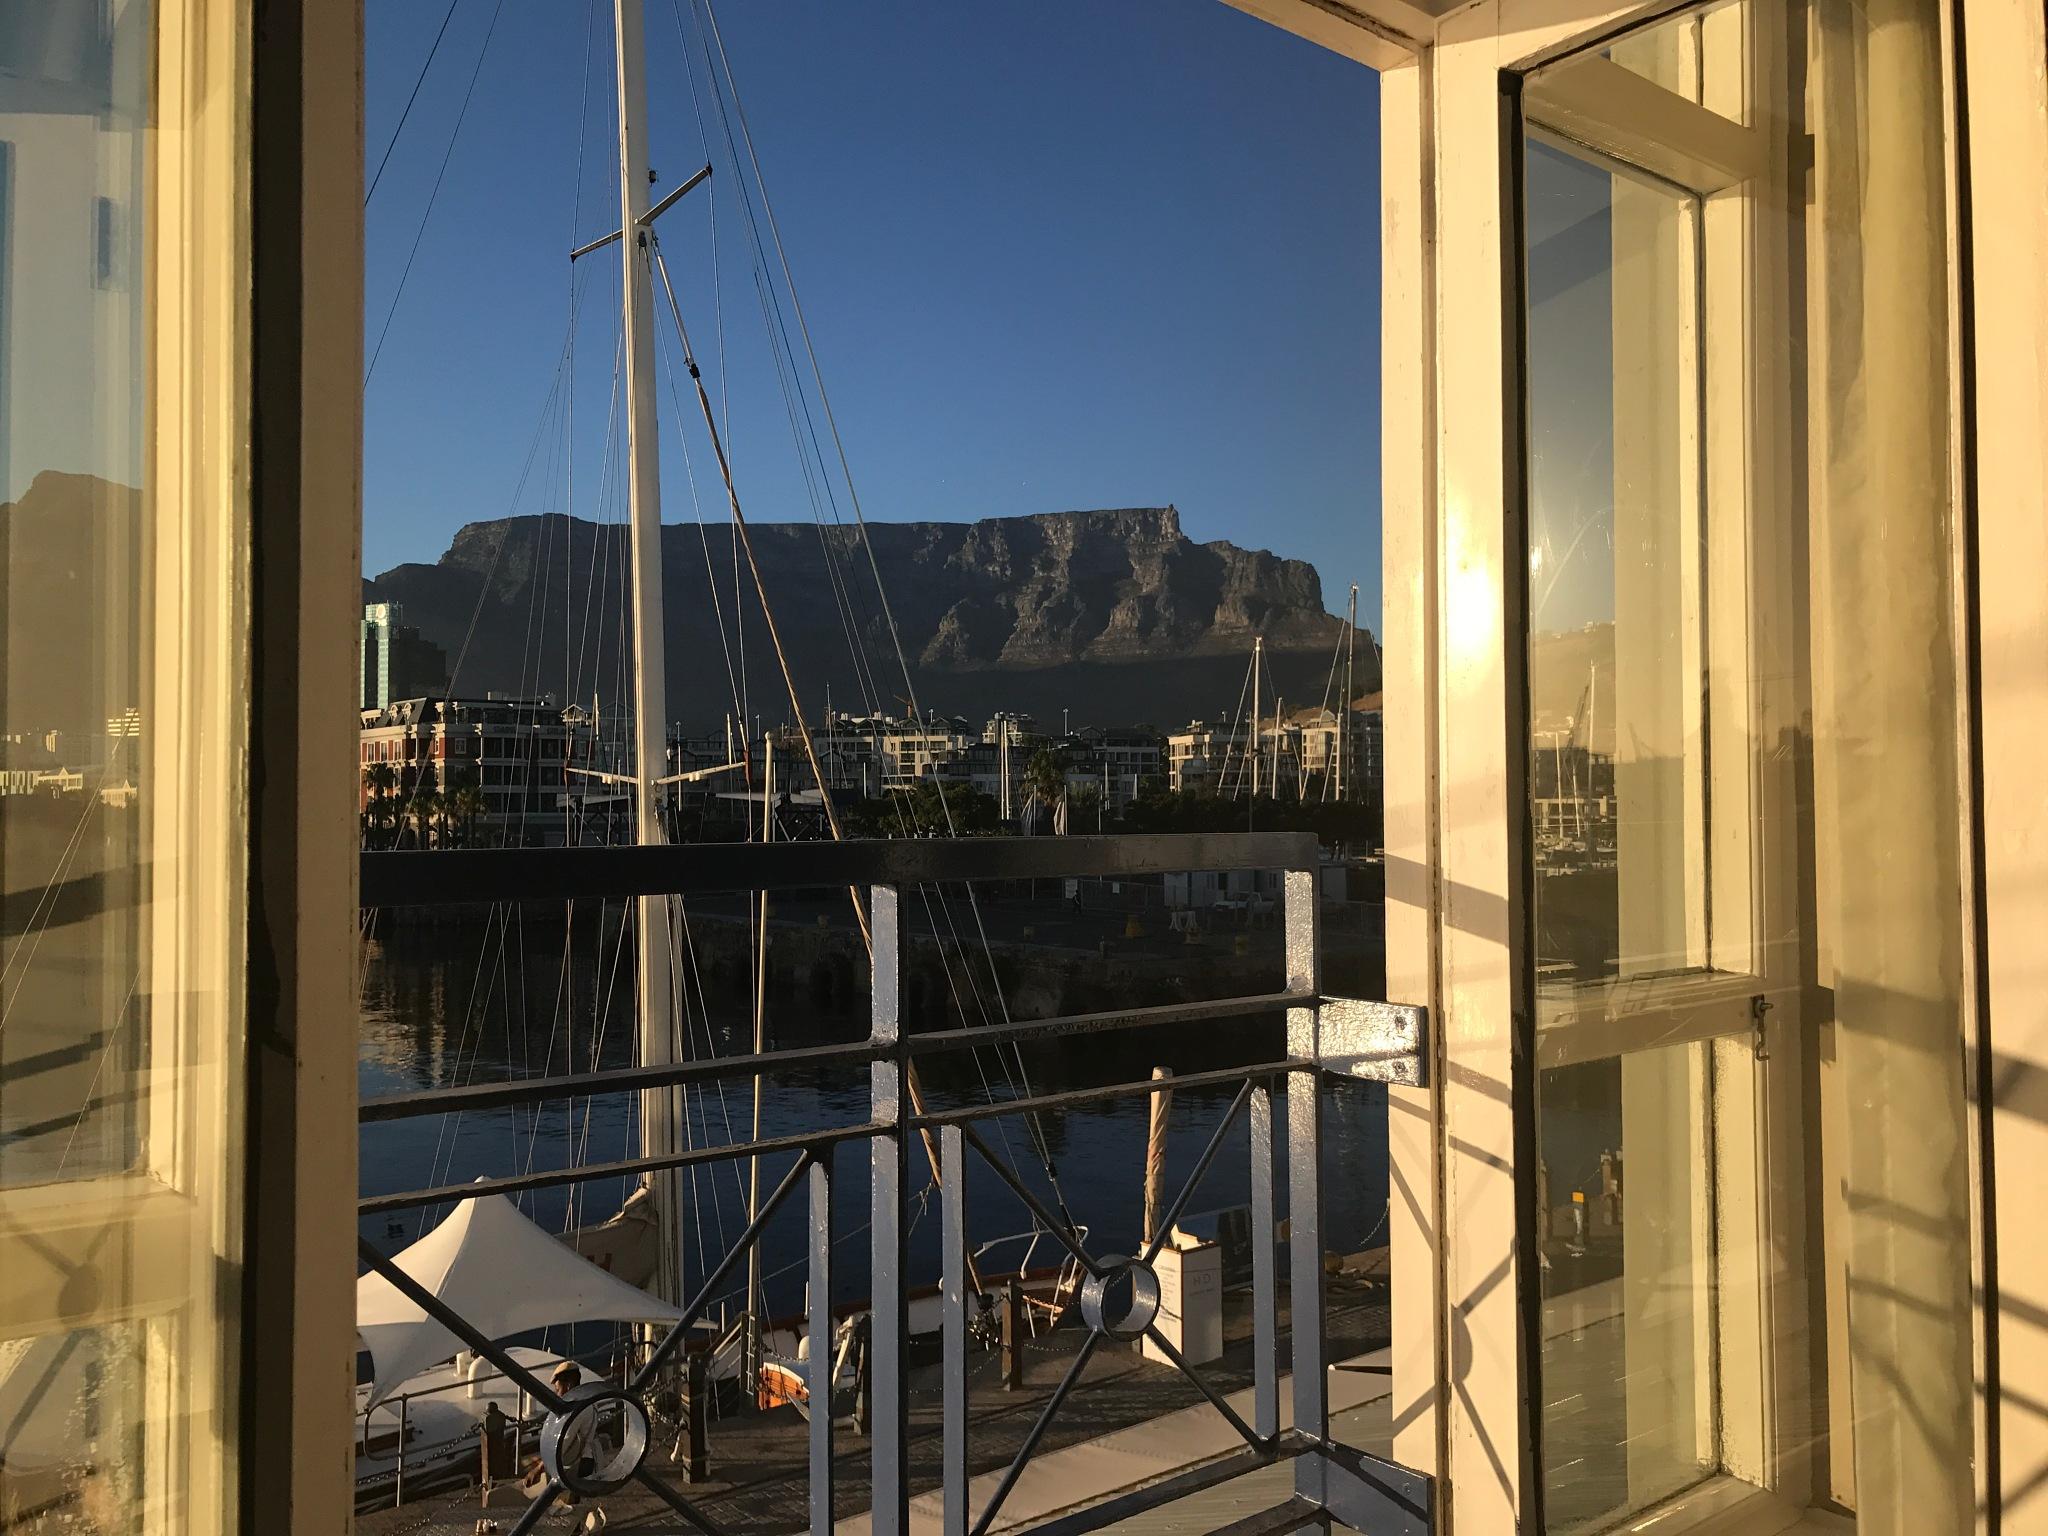 Table Mountain by Tinanina